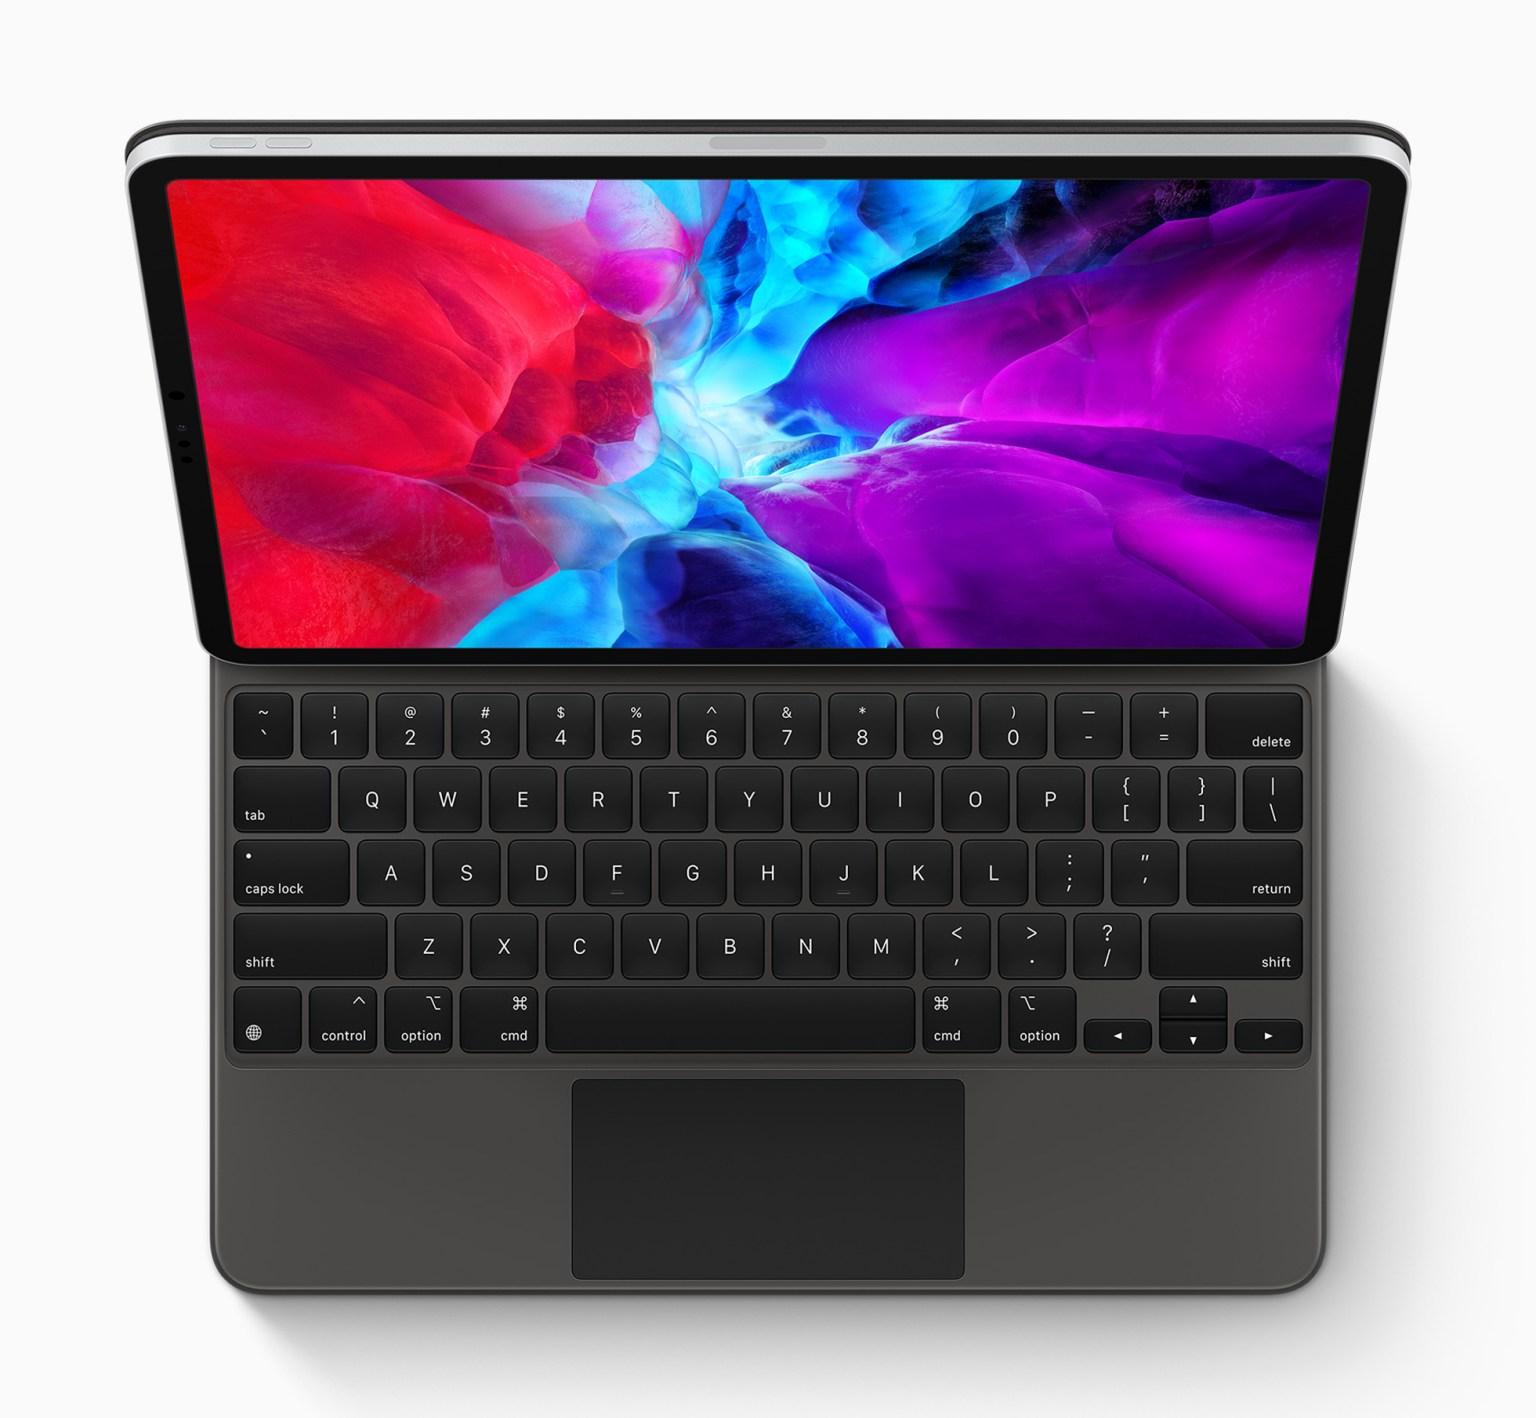 Apple new ipad pro keyboard 03182020